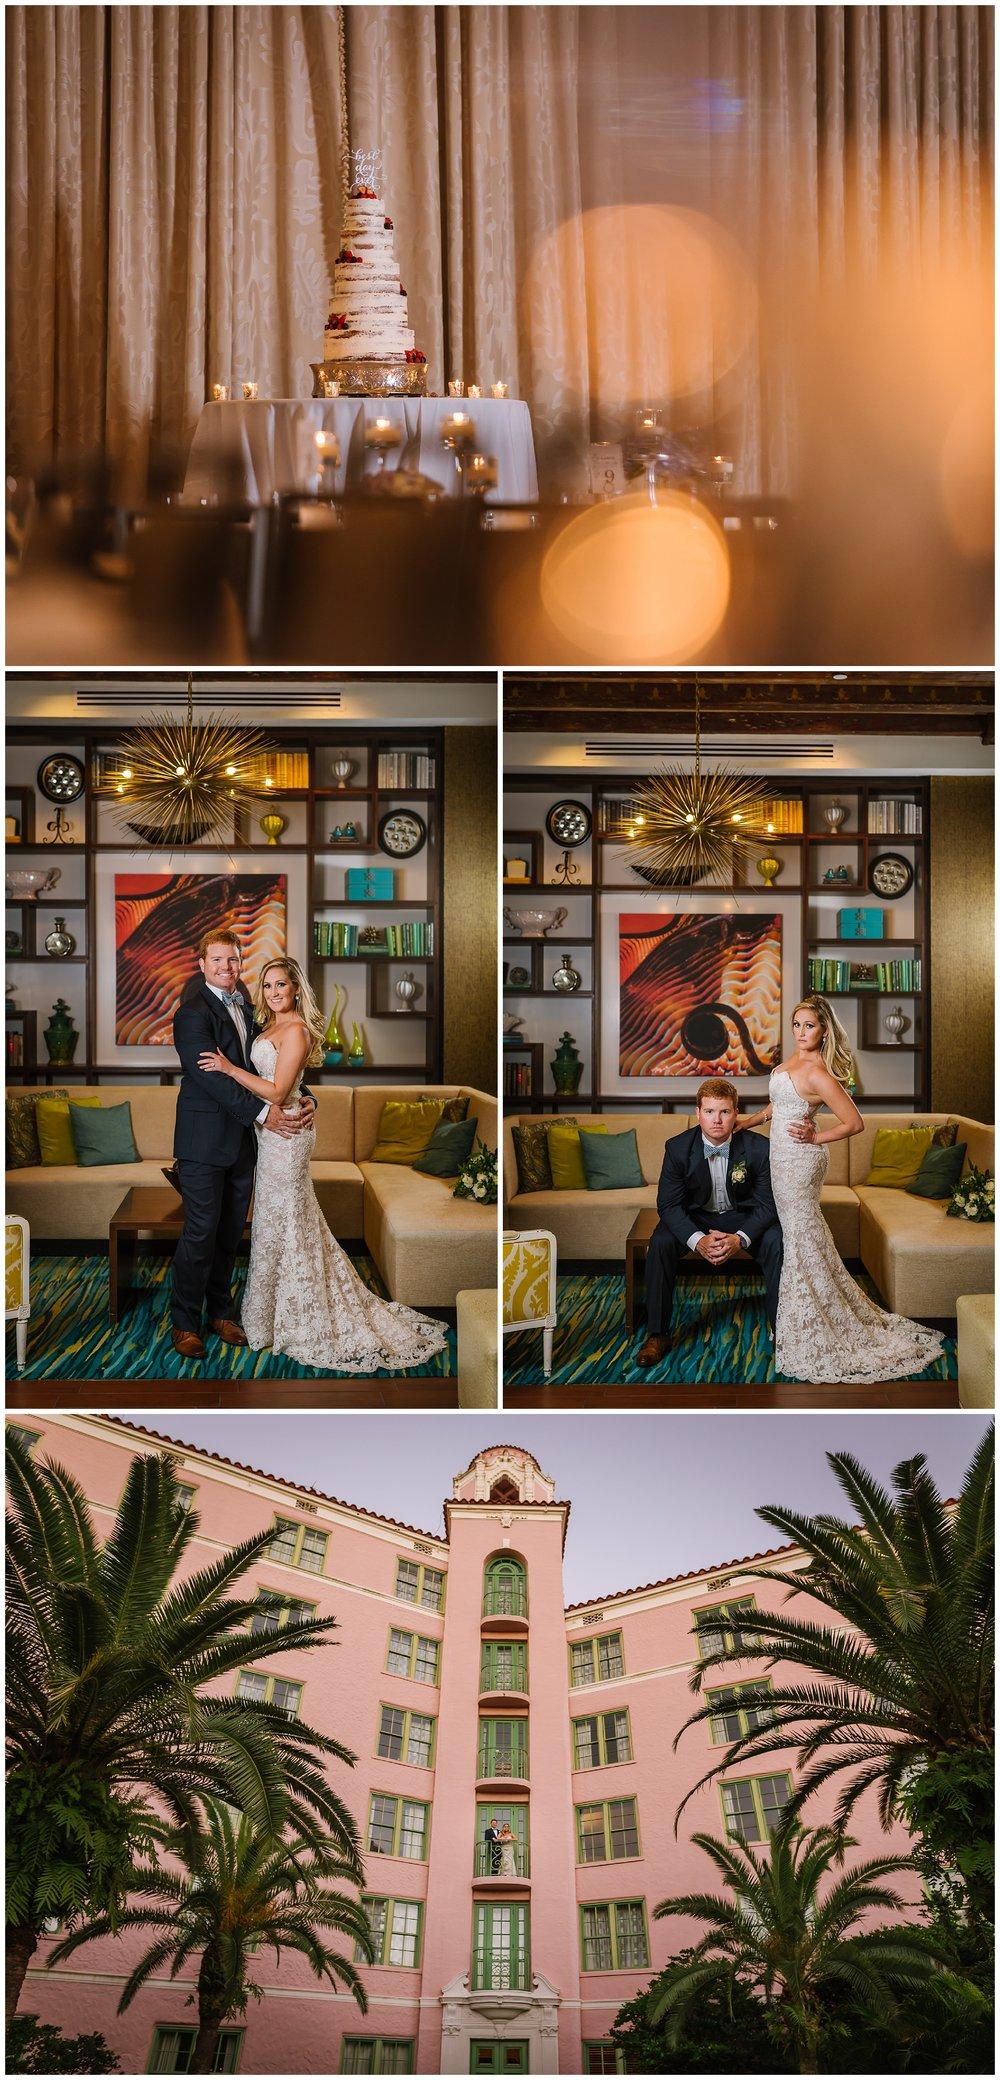 Ashlee-hamon-photography-year-in-review-2016-travel-wanderlust-vsco-adventure-wedding_0076.jpg